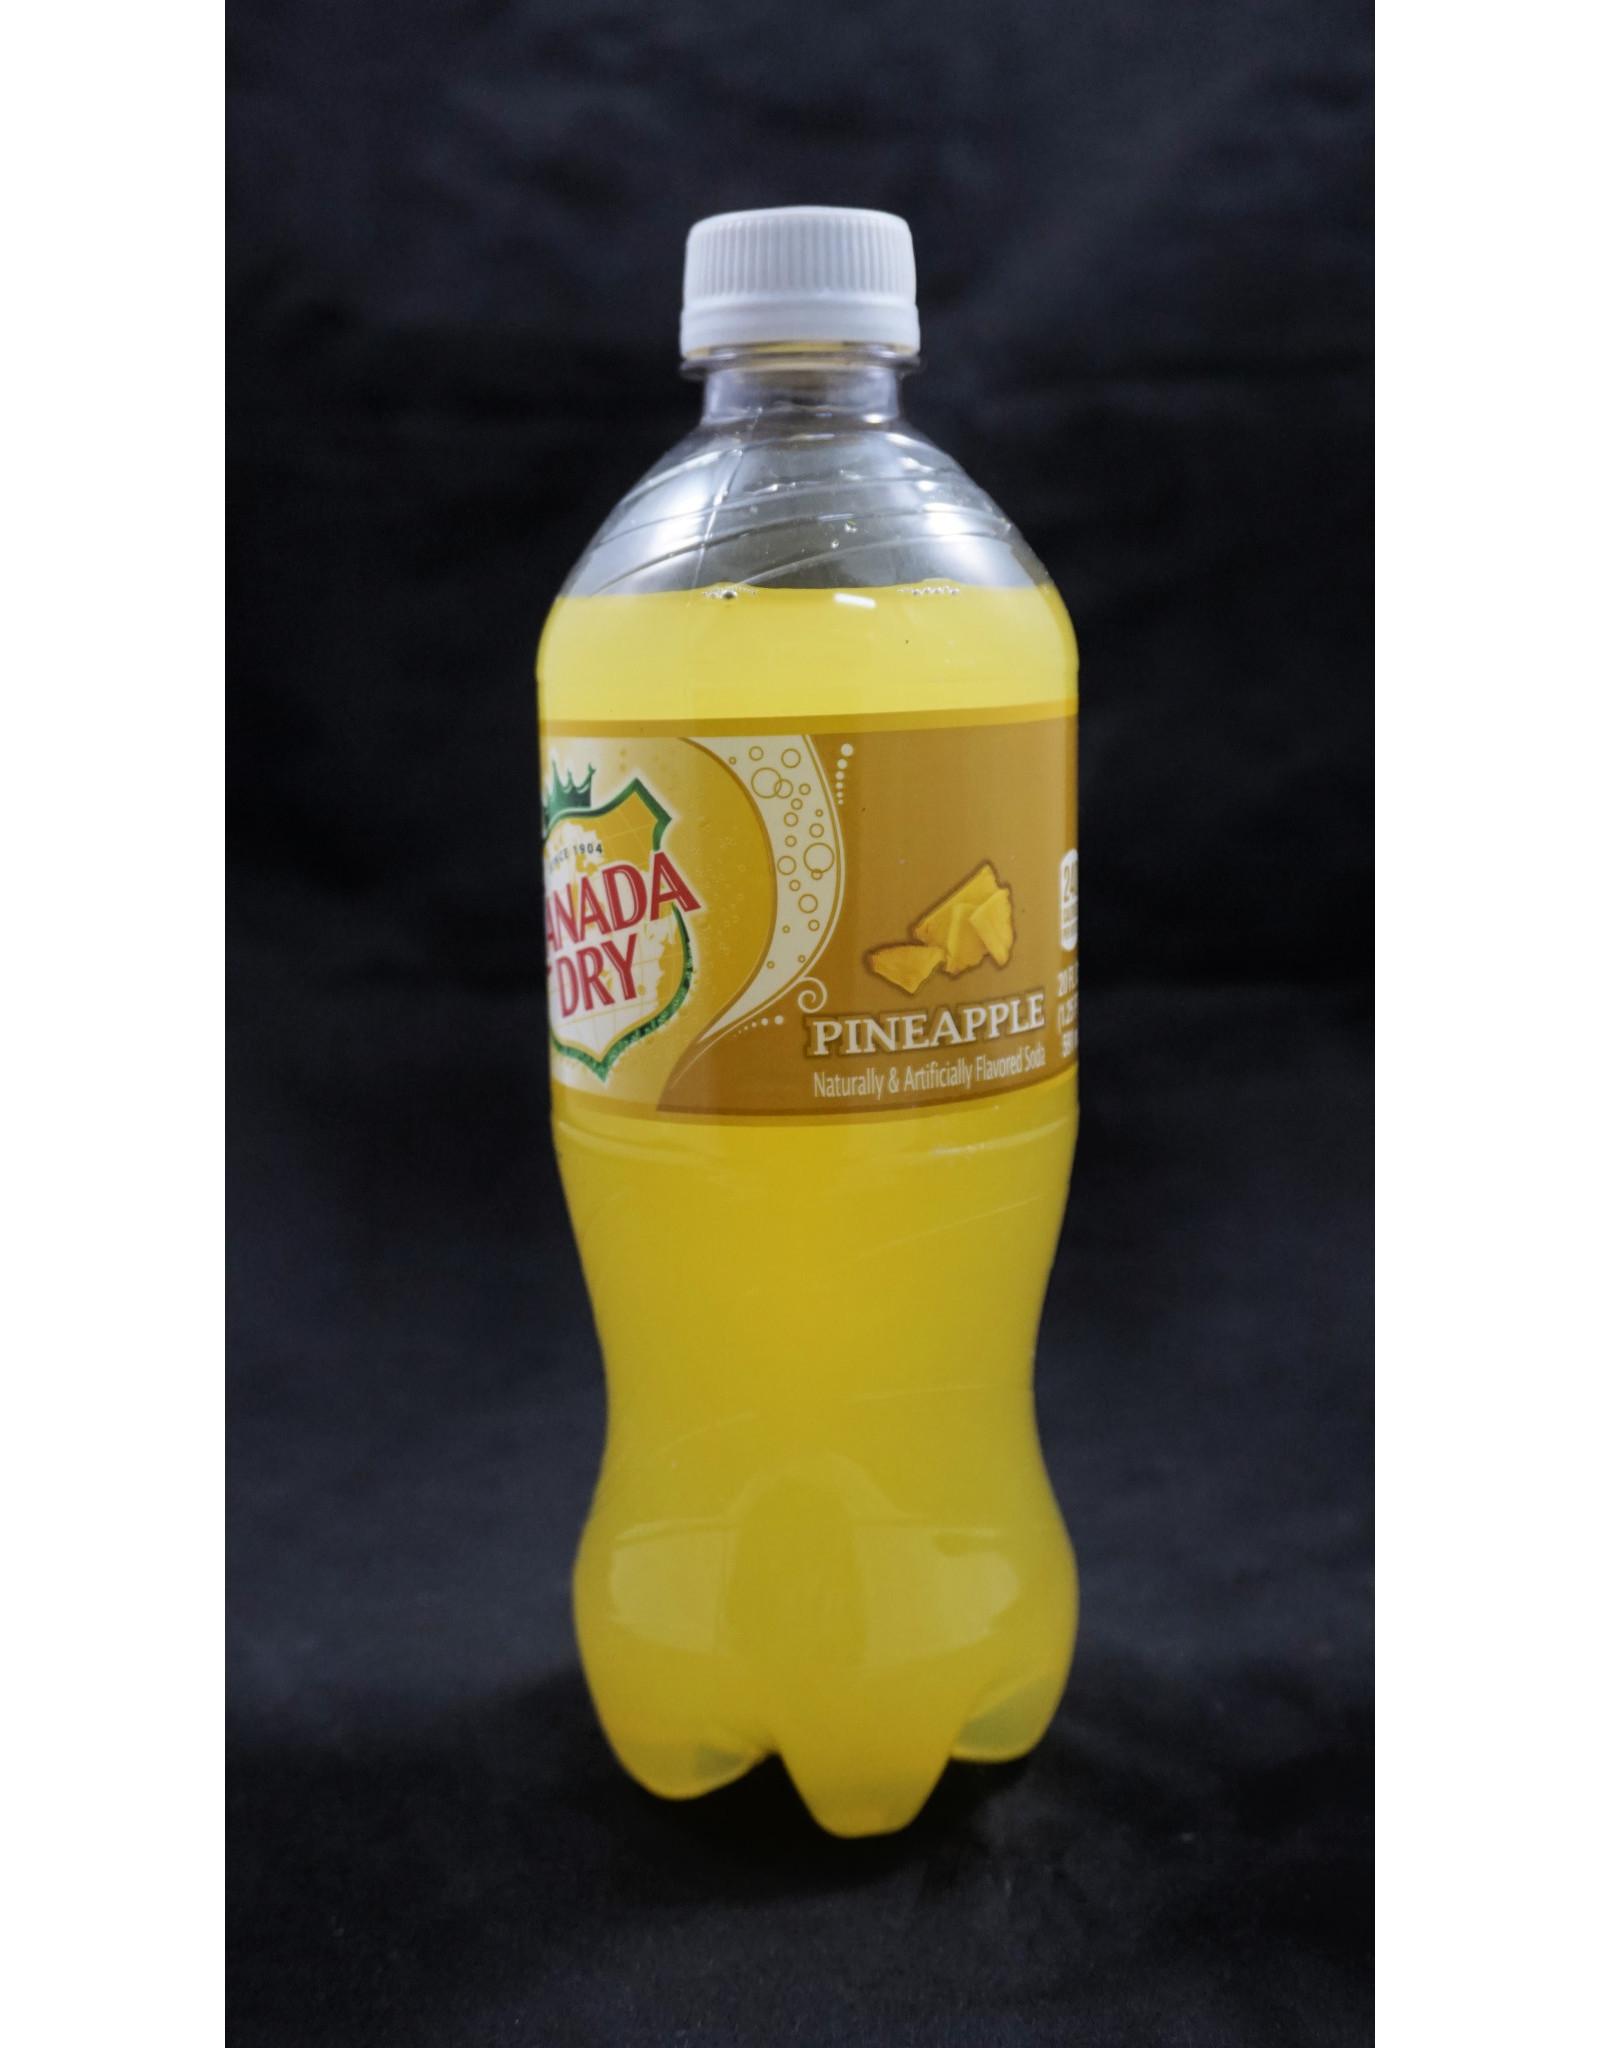 Canada Dry Pineapple Canada